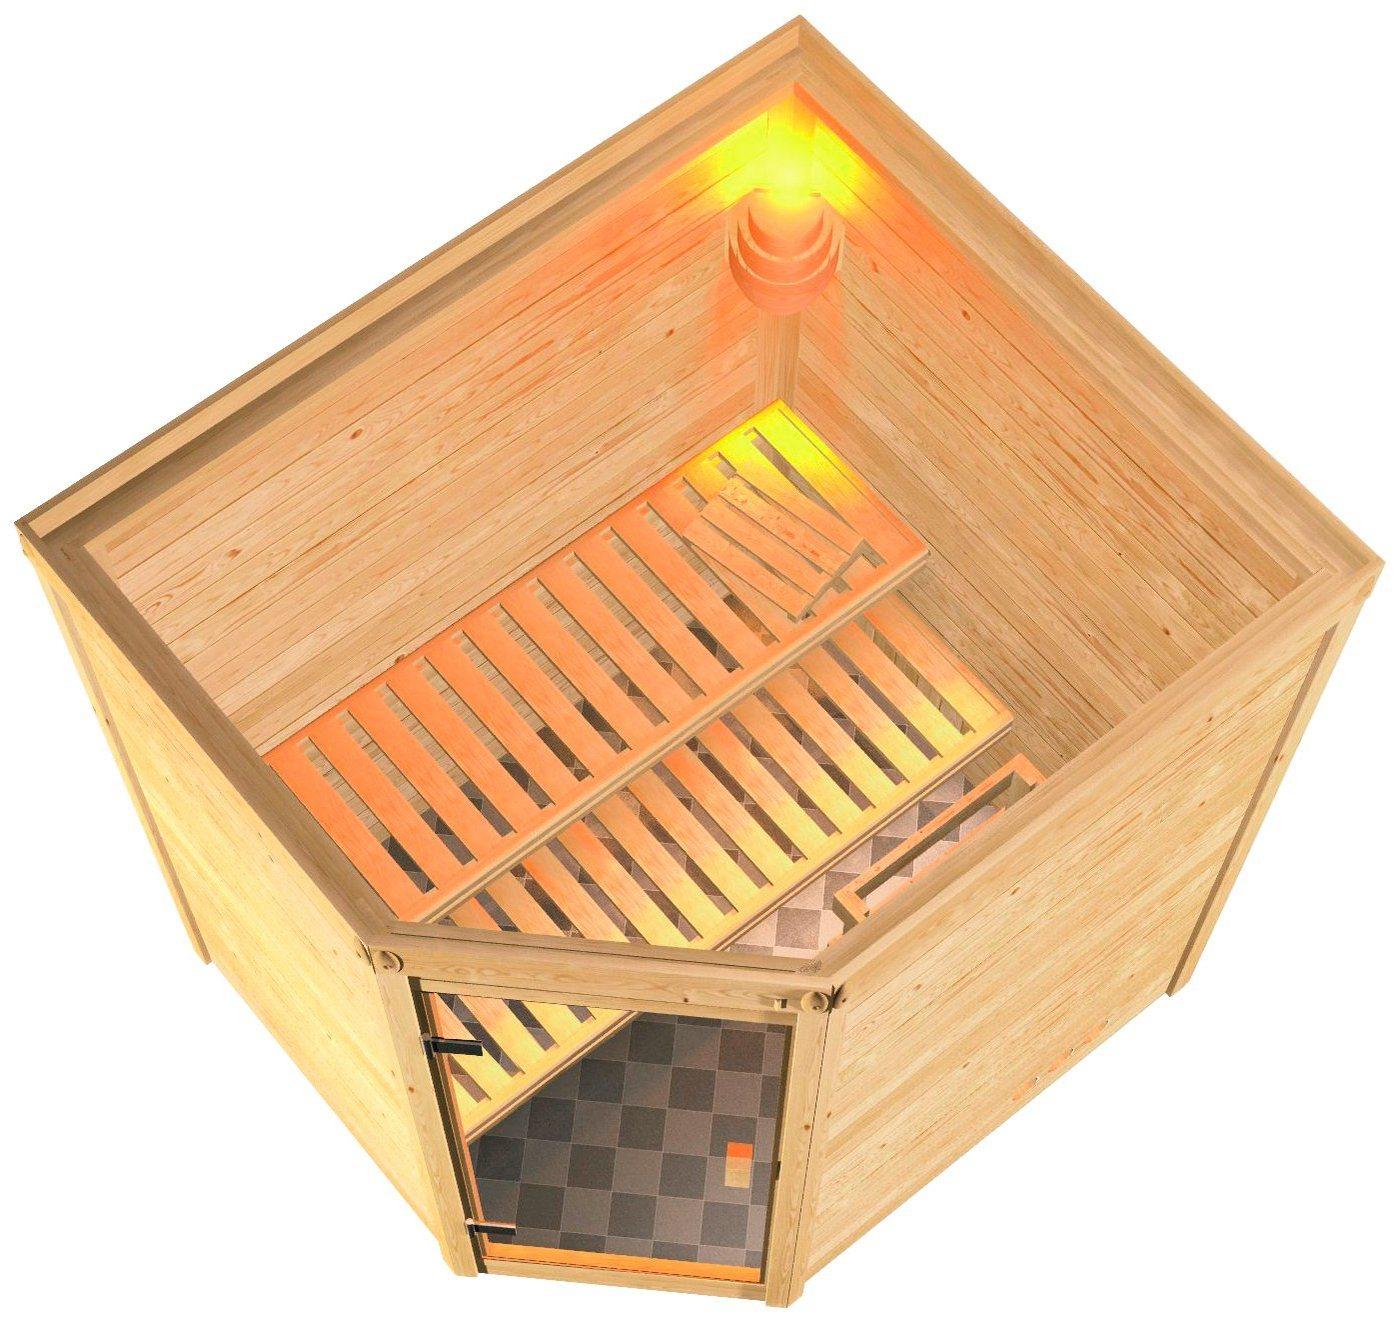 KARIBU Sauna »Mia«, 196/170/200 cm, 9-kW-Bio-Ofen mit ext. Strg., Glastür grafit